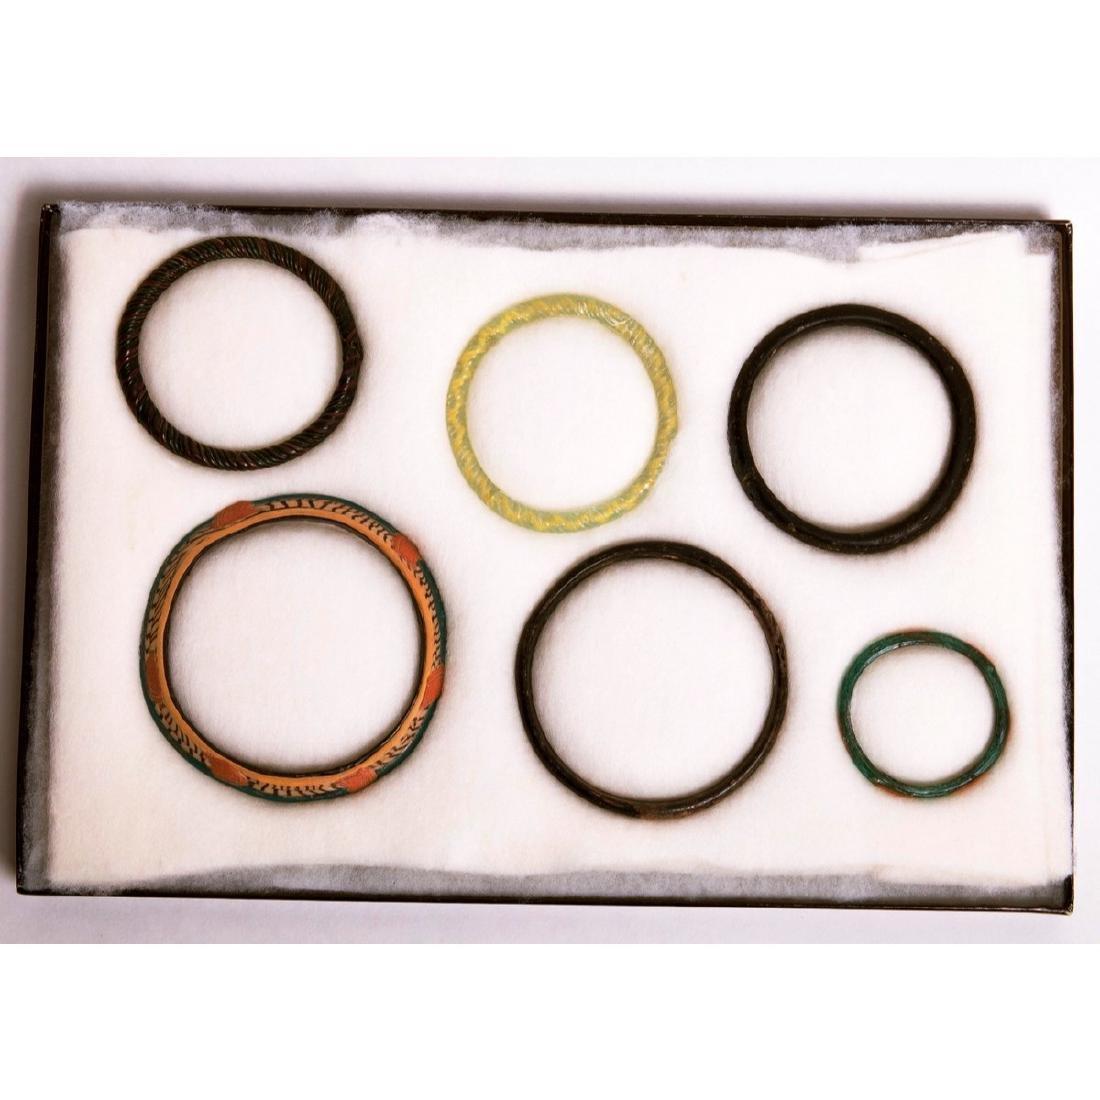 Lot of 6 Ancient Roman Glass Bracelets c.2nd cen AD